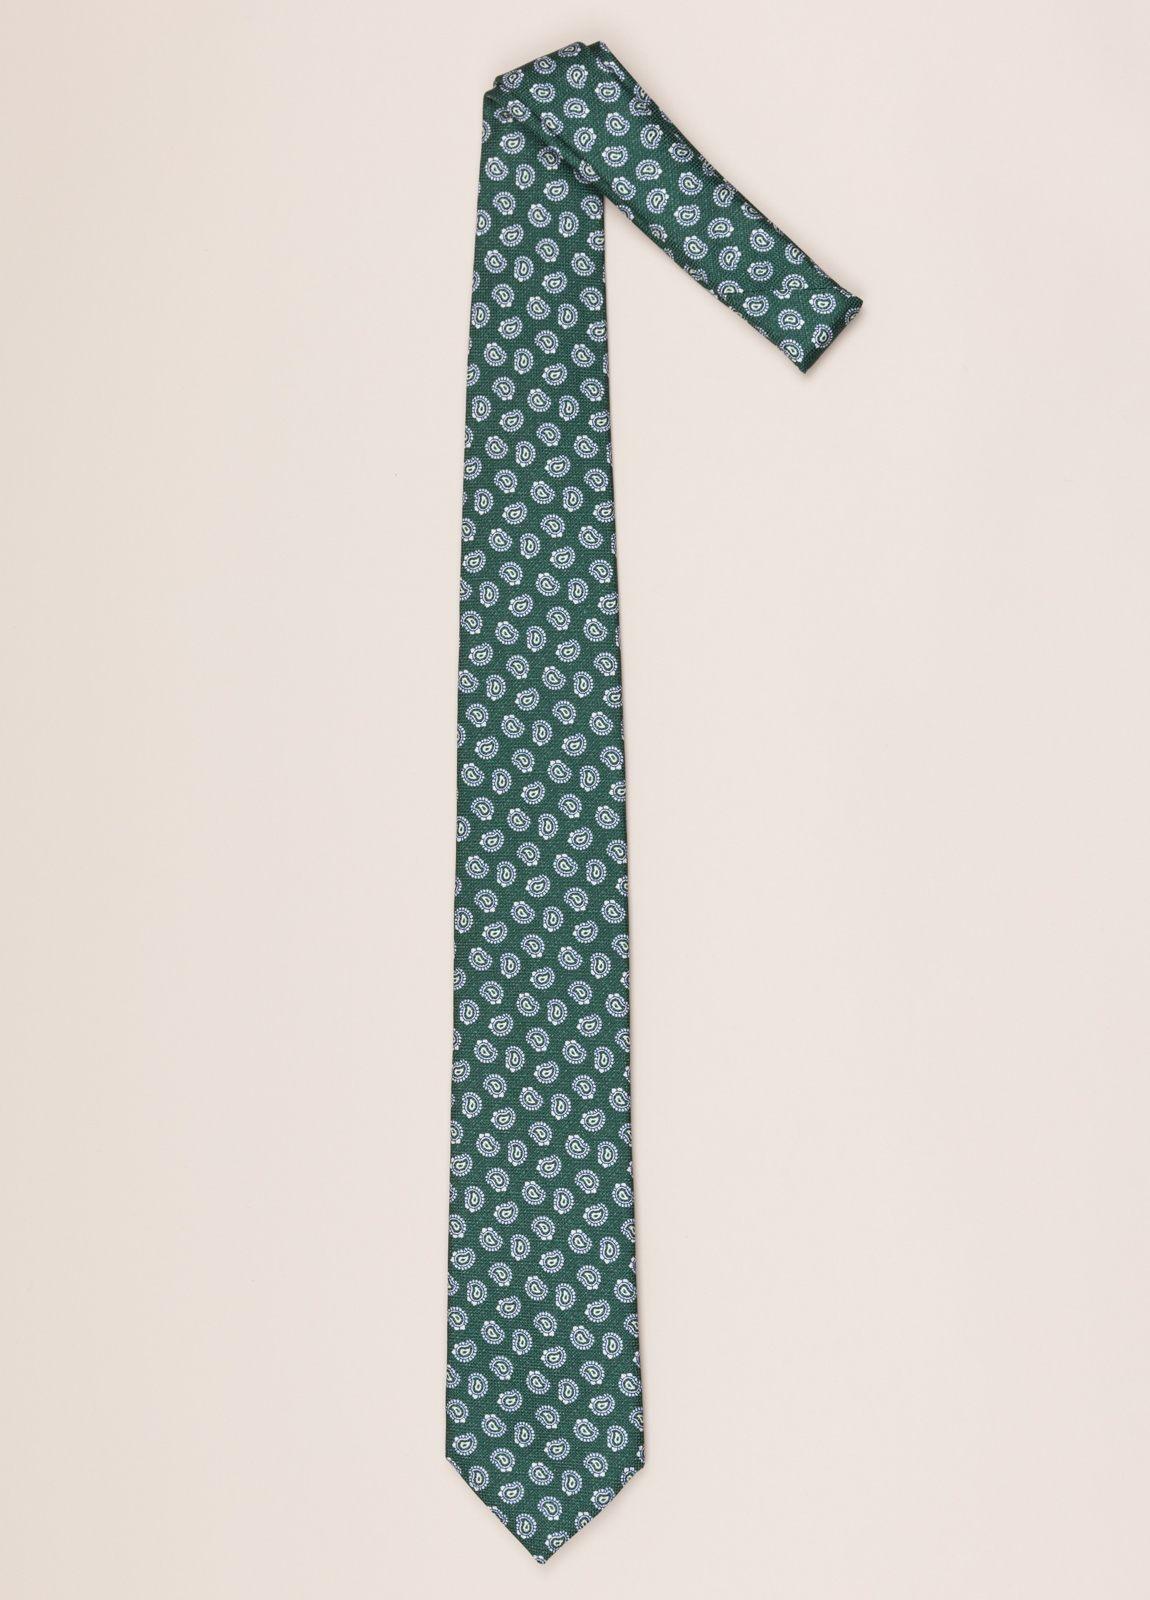 Corbata FUREST COLECCIÓN dibujo verde - Ítem1